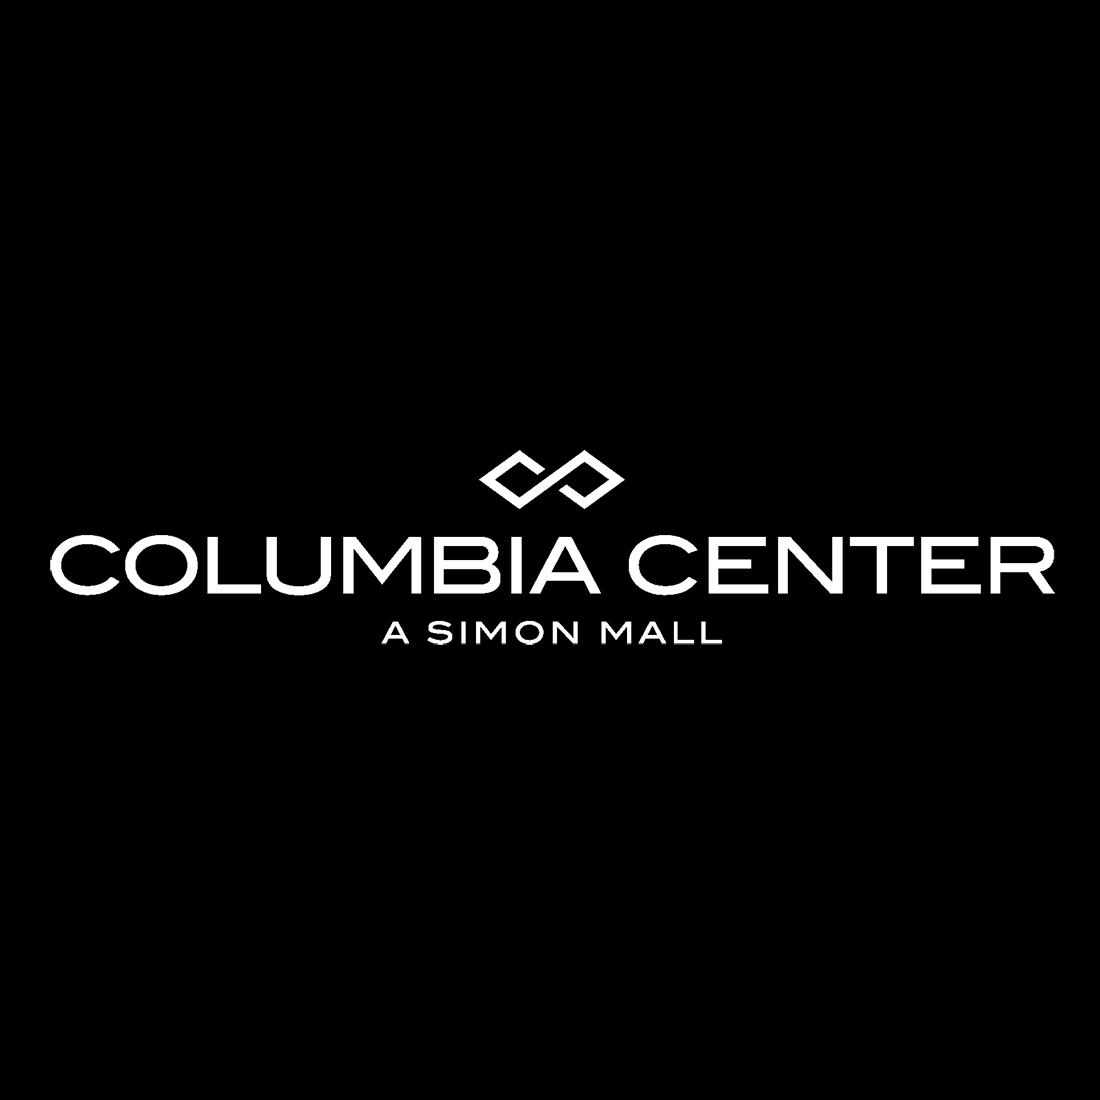 Columbia Center image 17